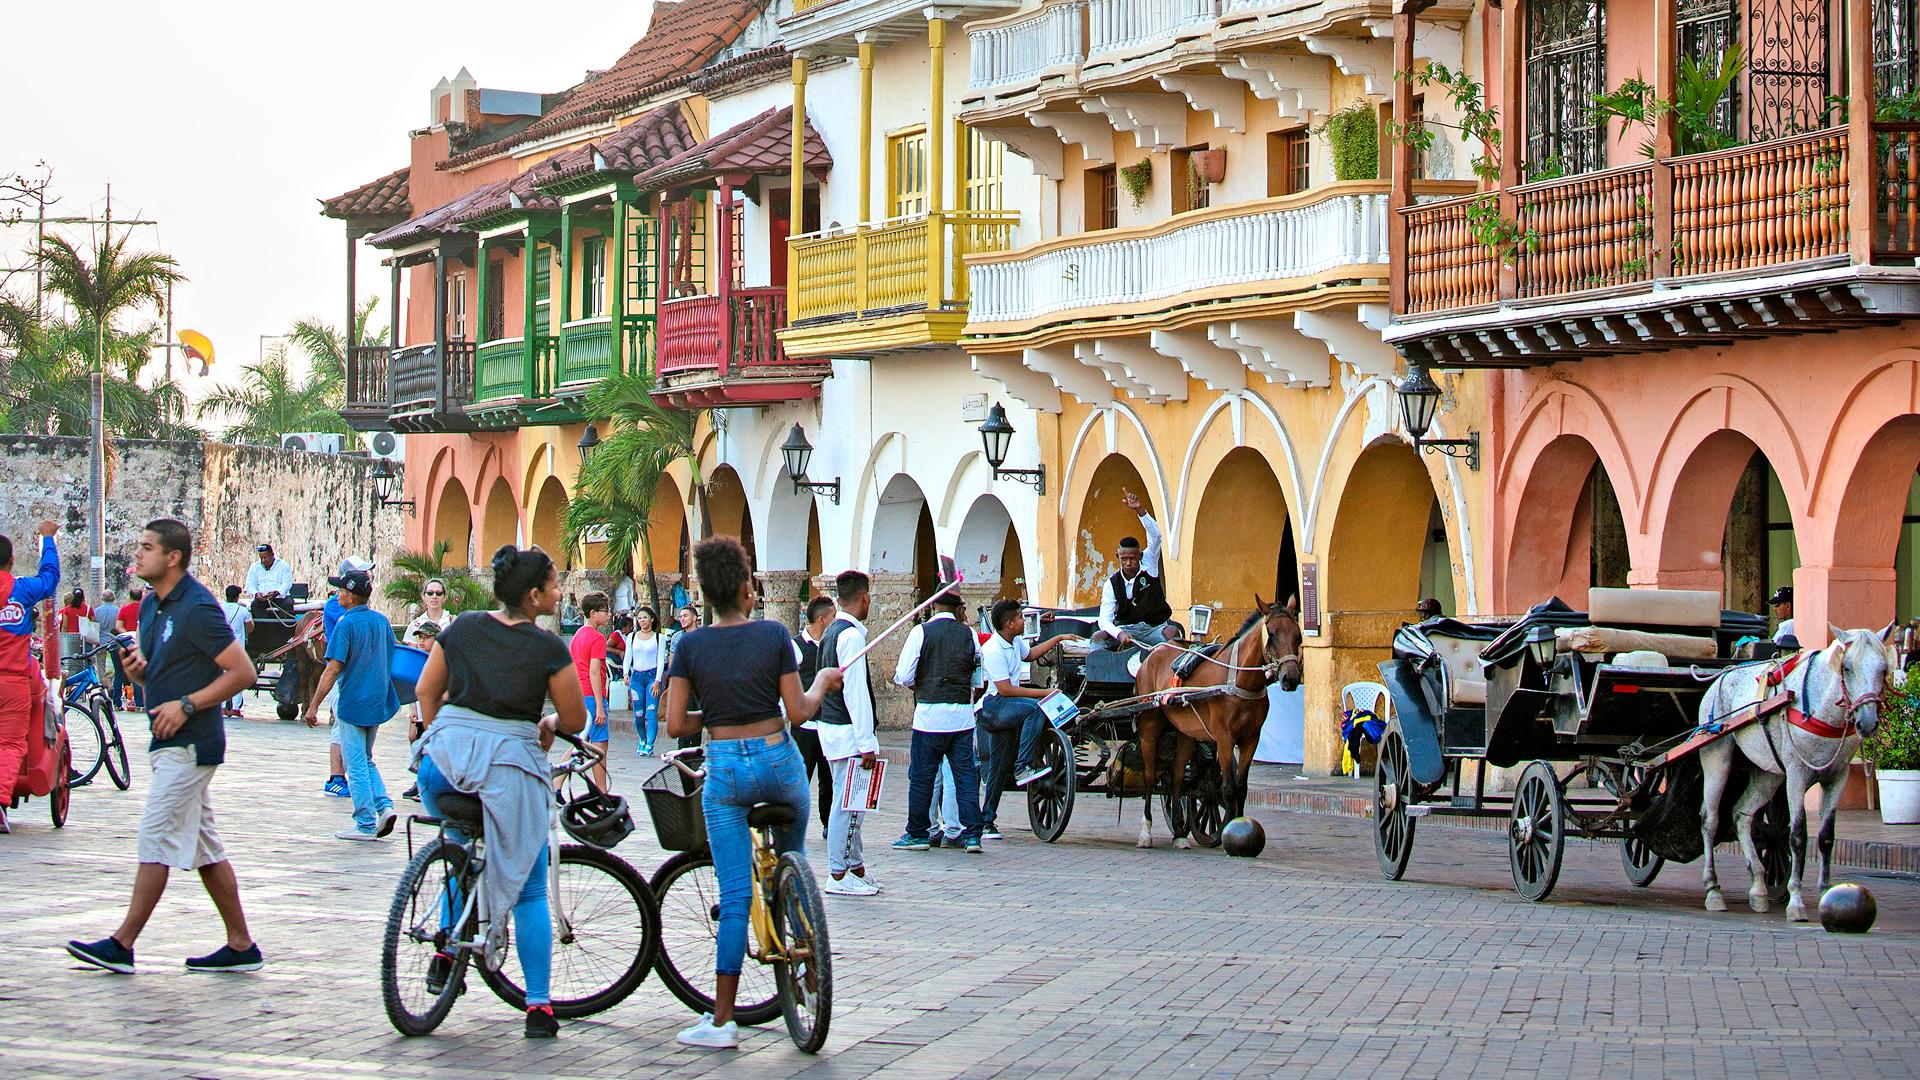 Vanhan kaupungin värikkäät talot